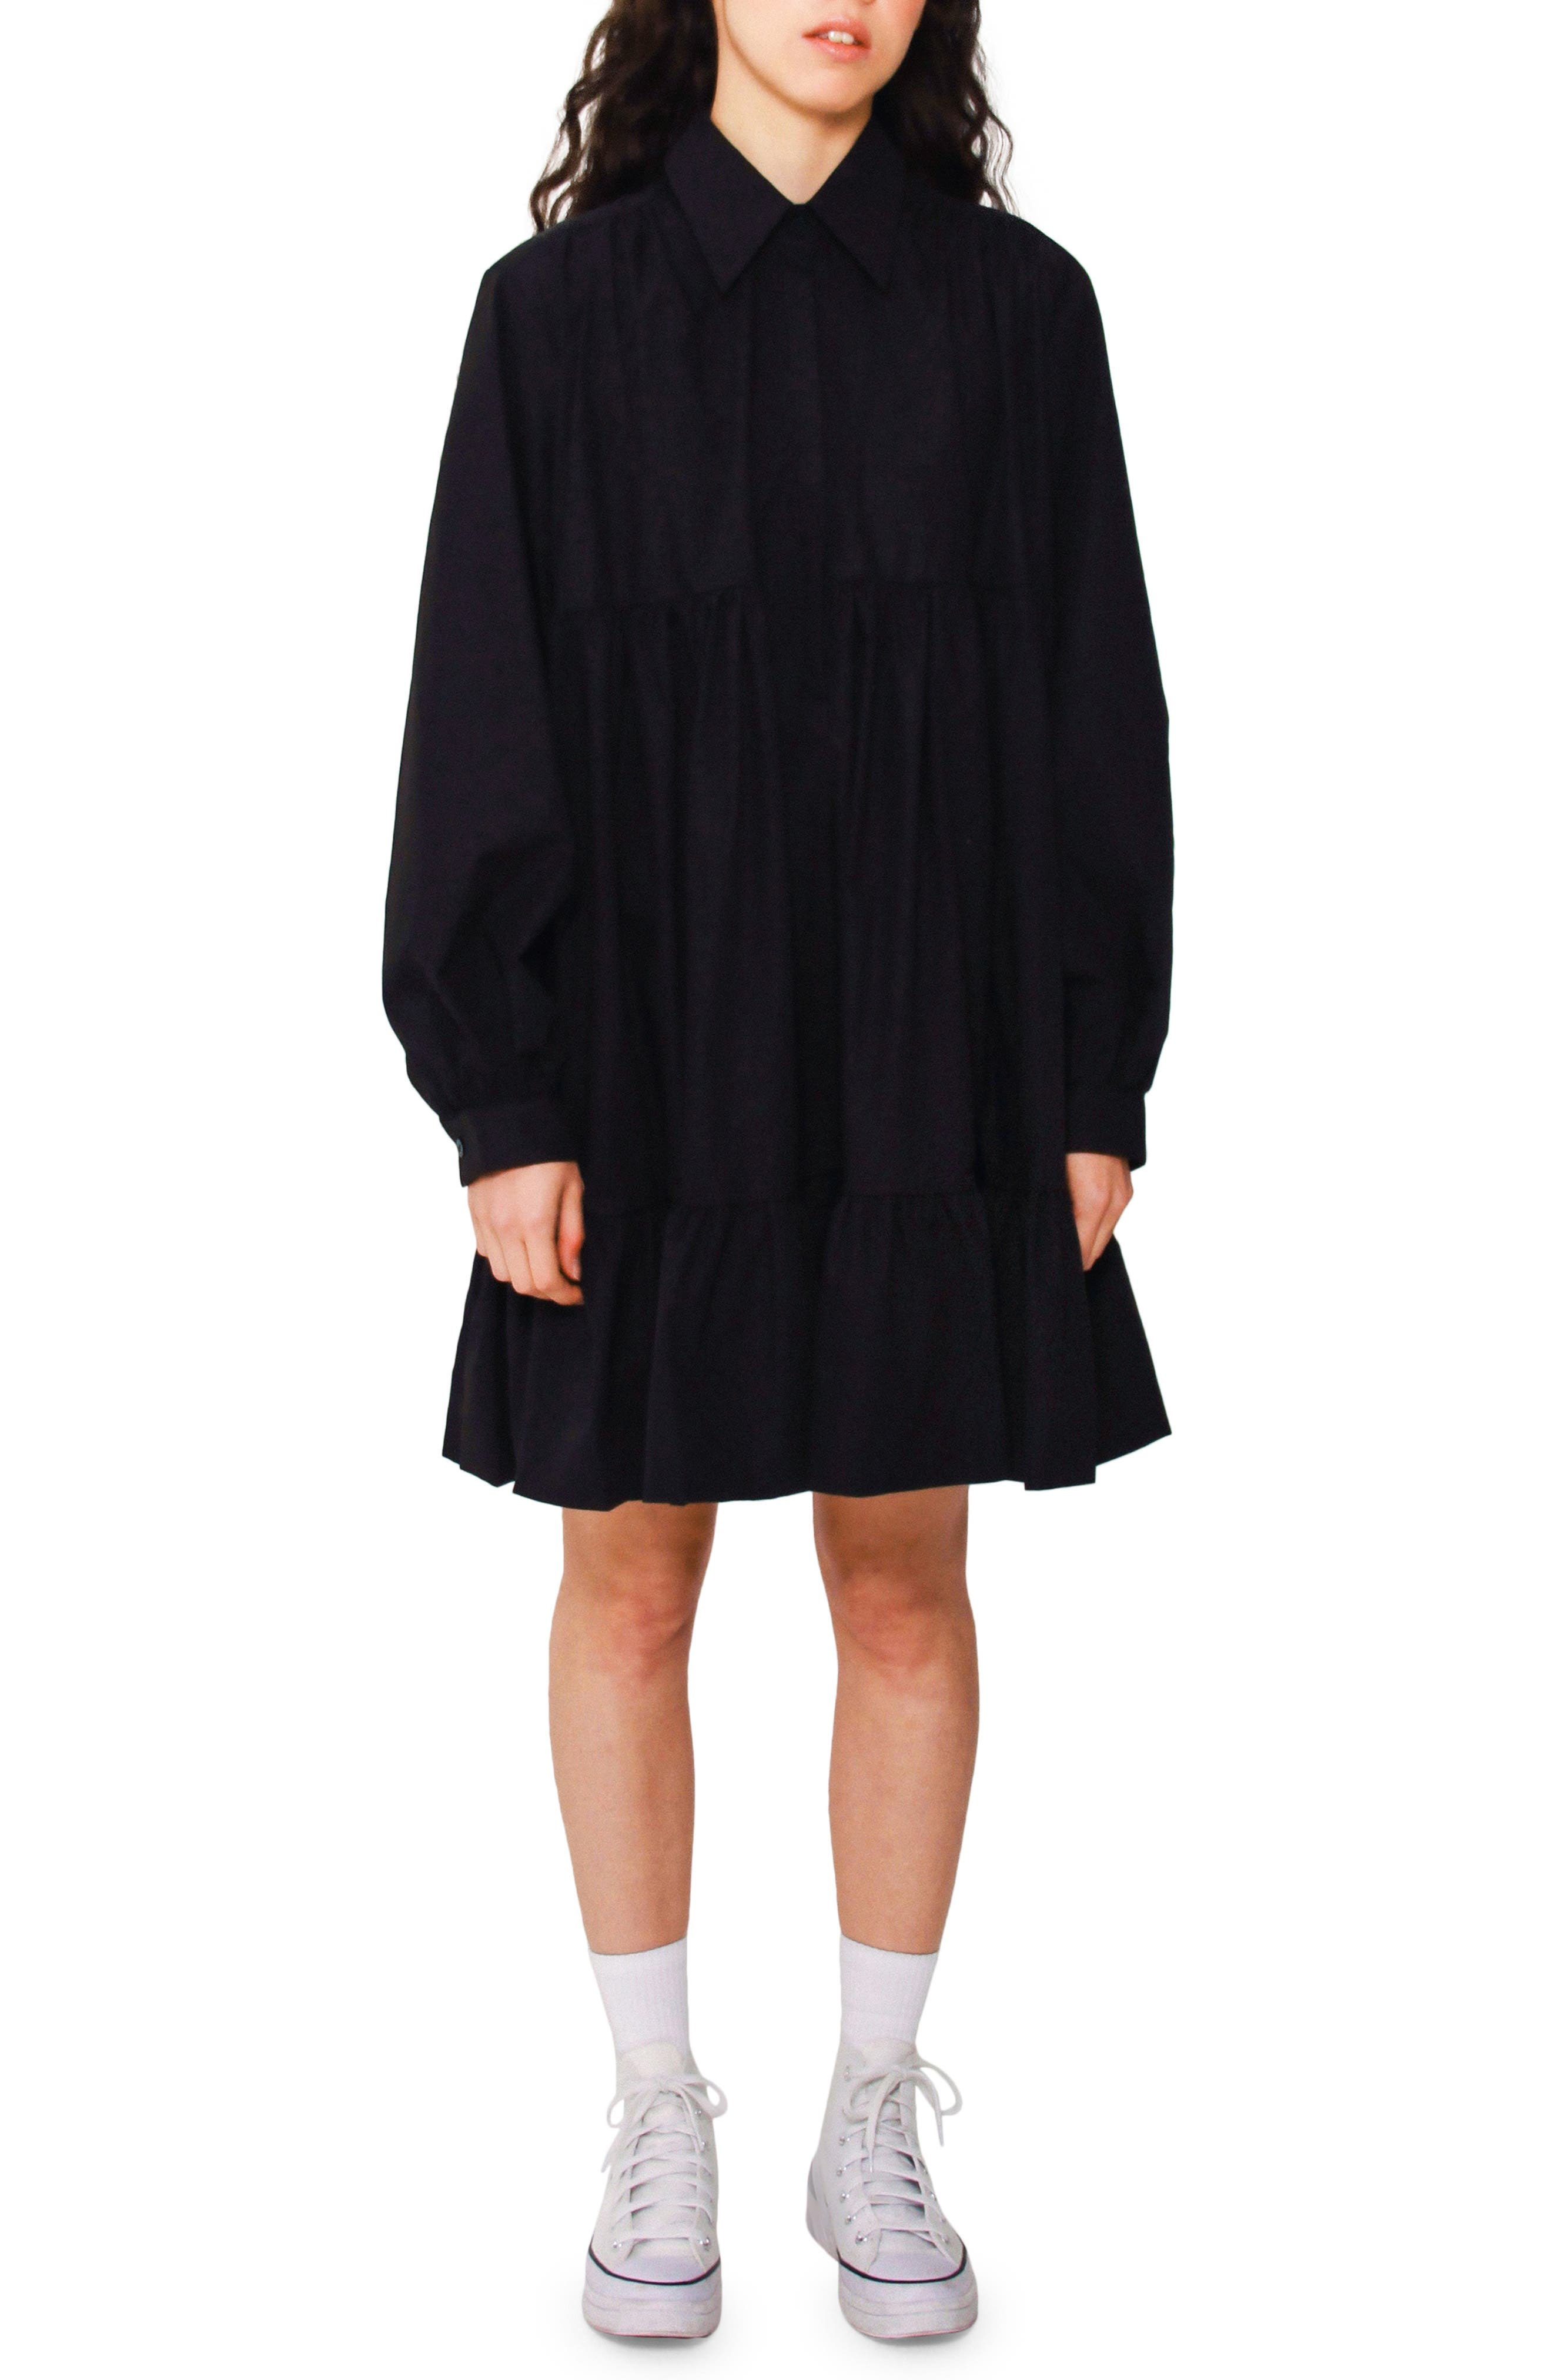 Lilly Long Sleeve Swing Dress